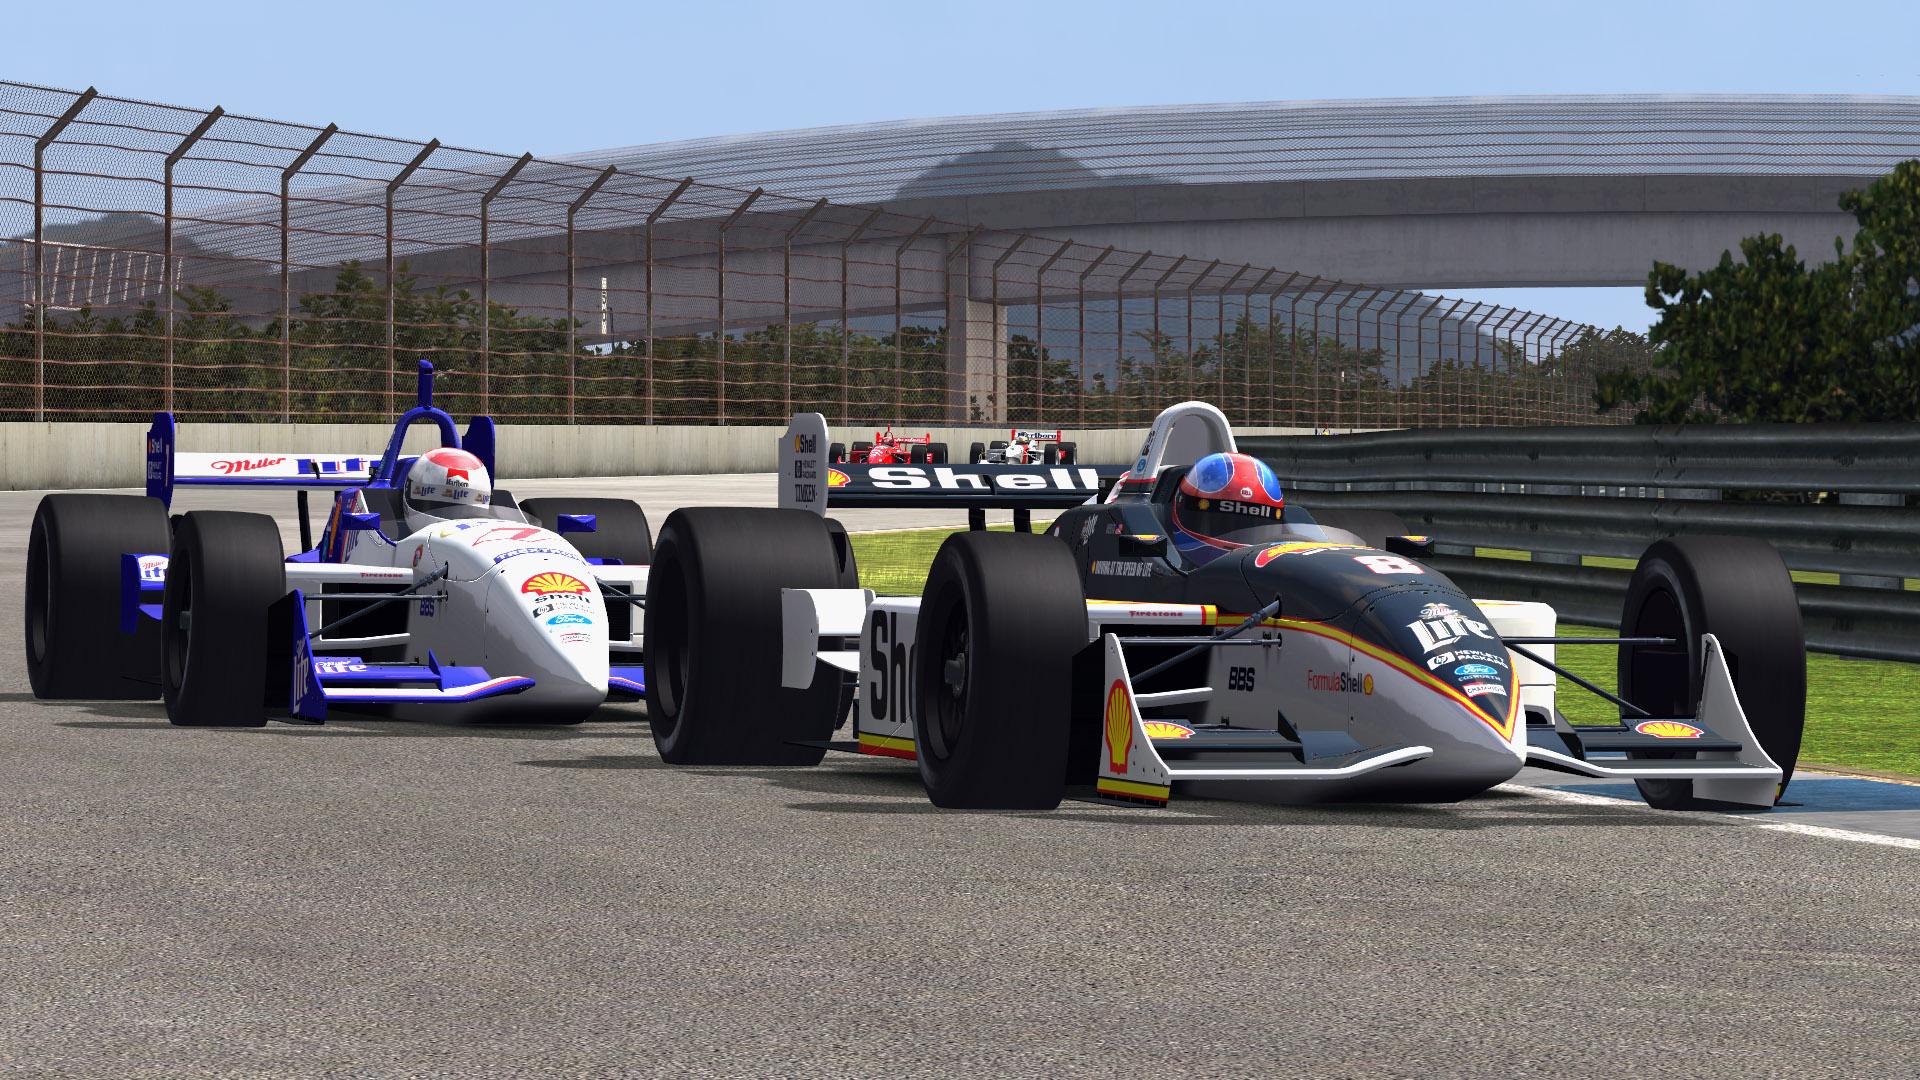 C A R T  Extreme | RaceDepartment - Latest Formula 1, Motorsport